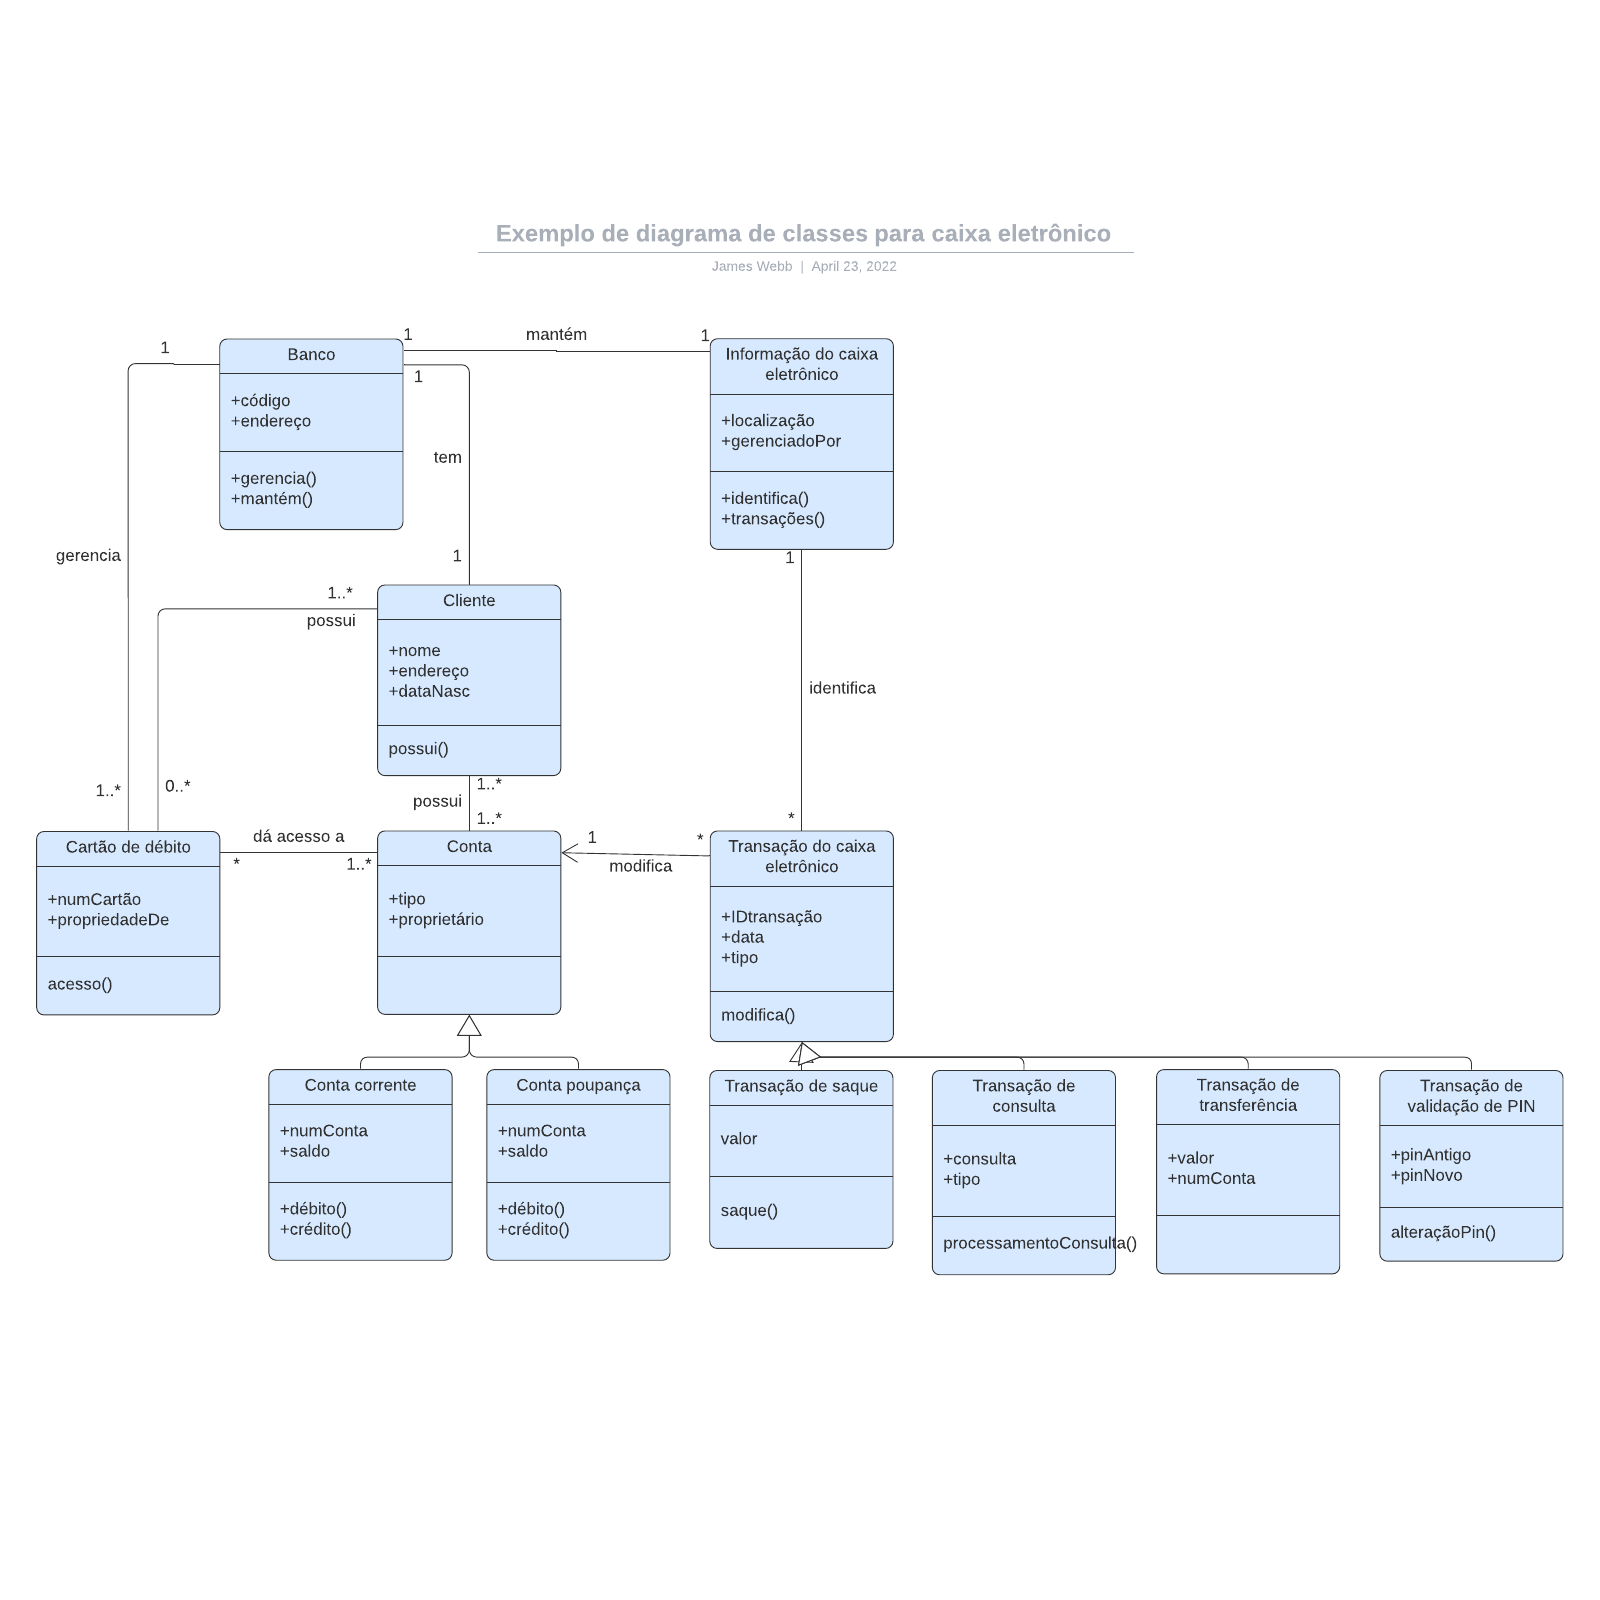 Exemplo de diagrama de classes para caixa eletrônico